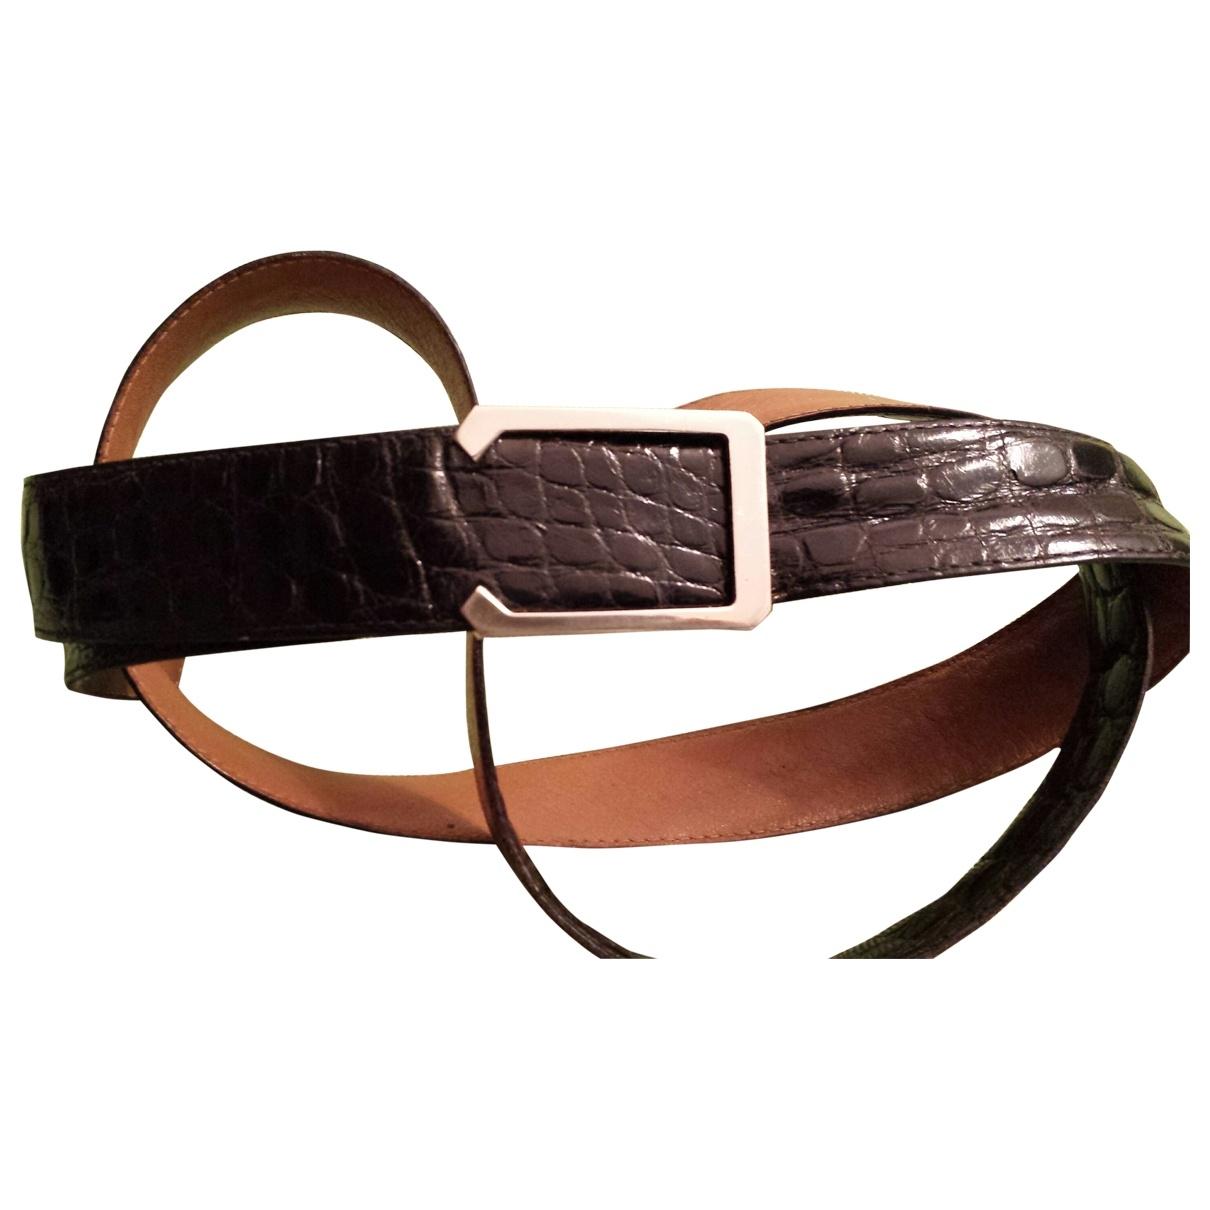 Cinturon de Cocodrilo A. Testoni